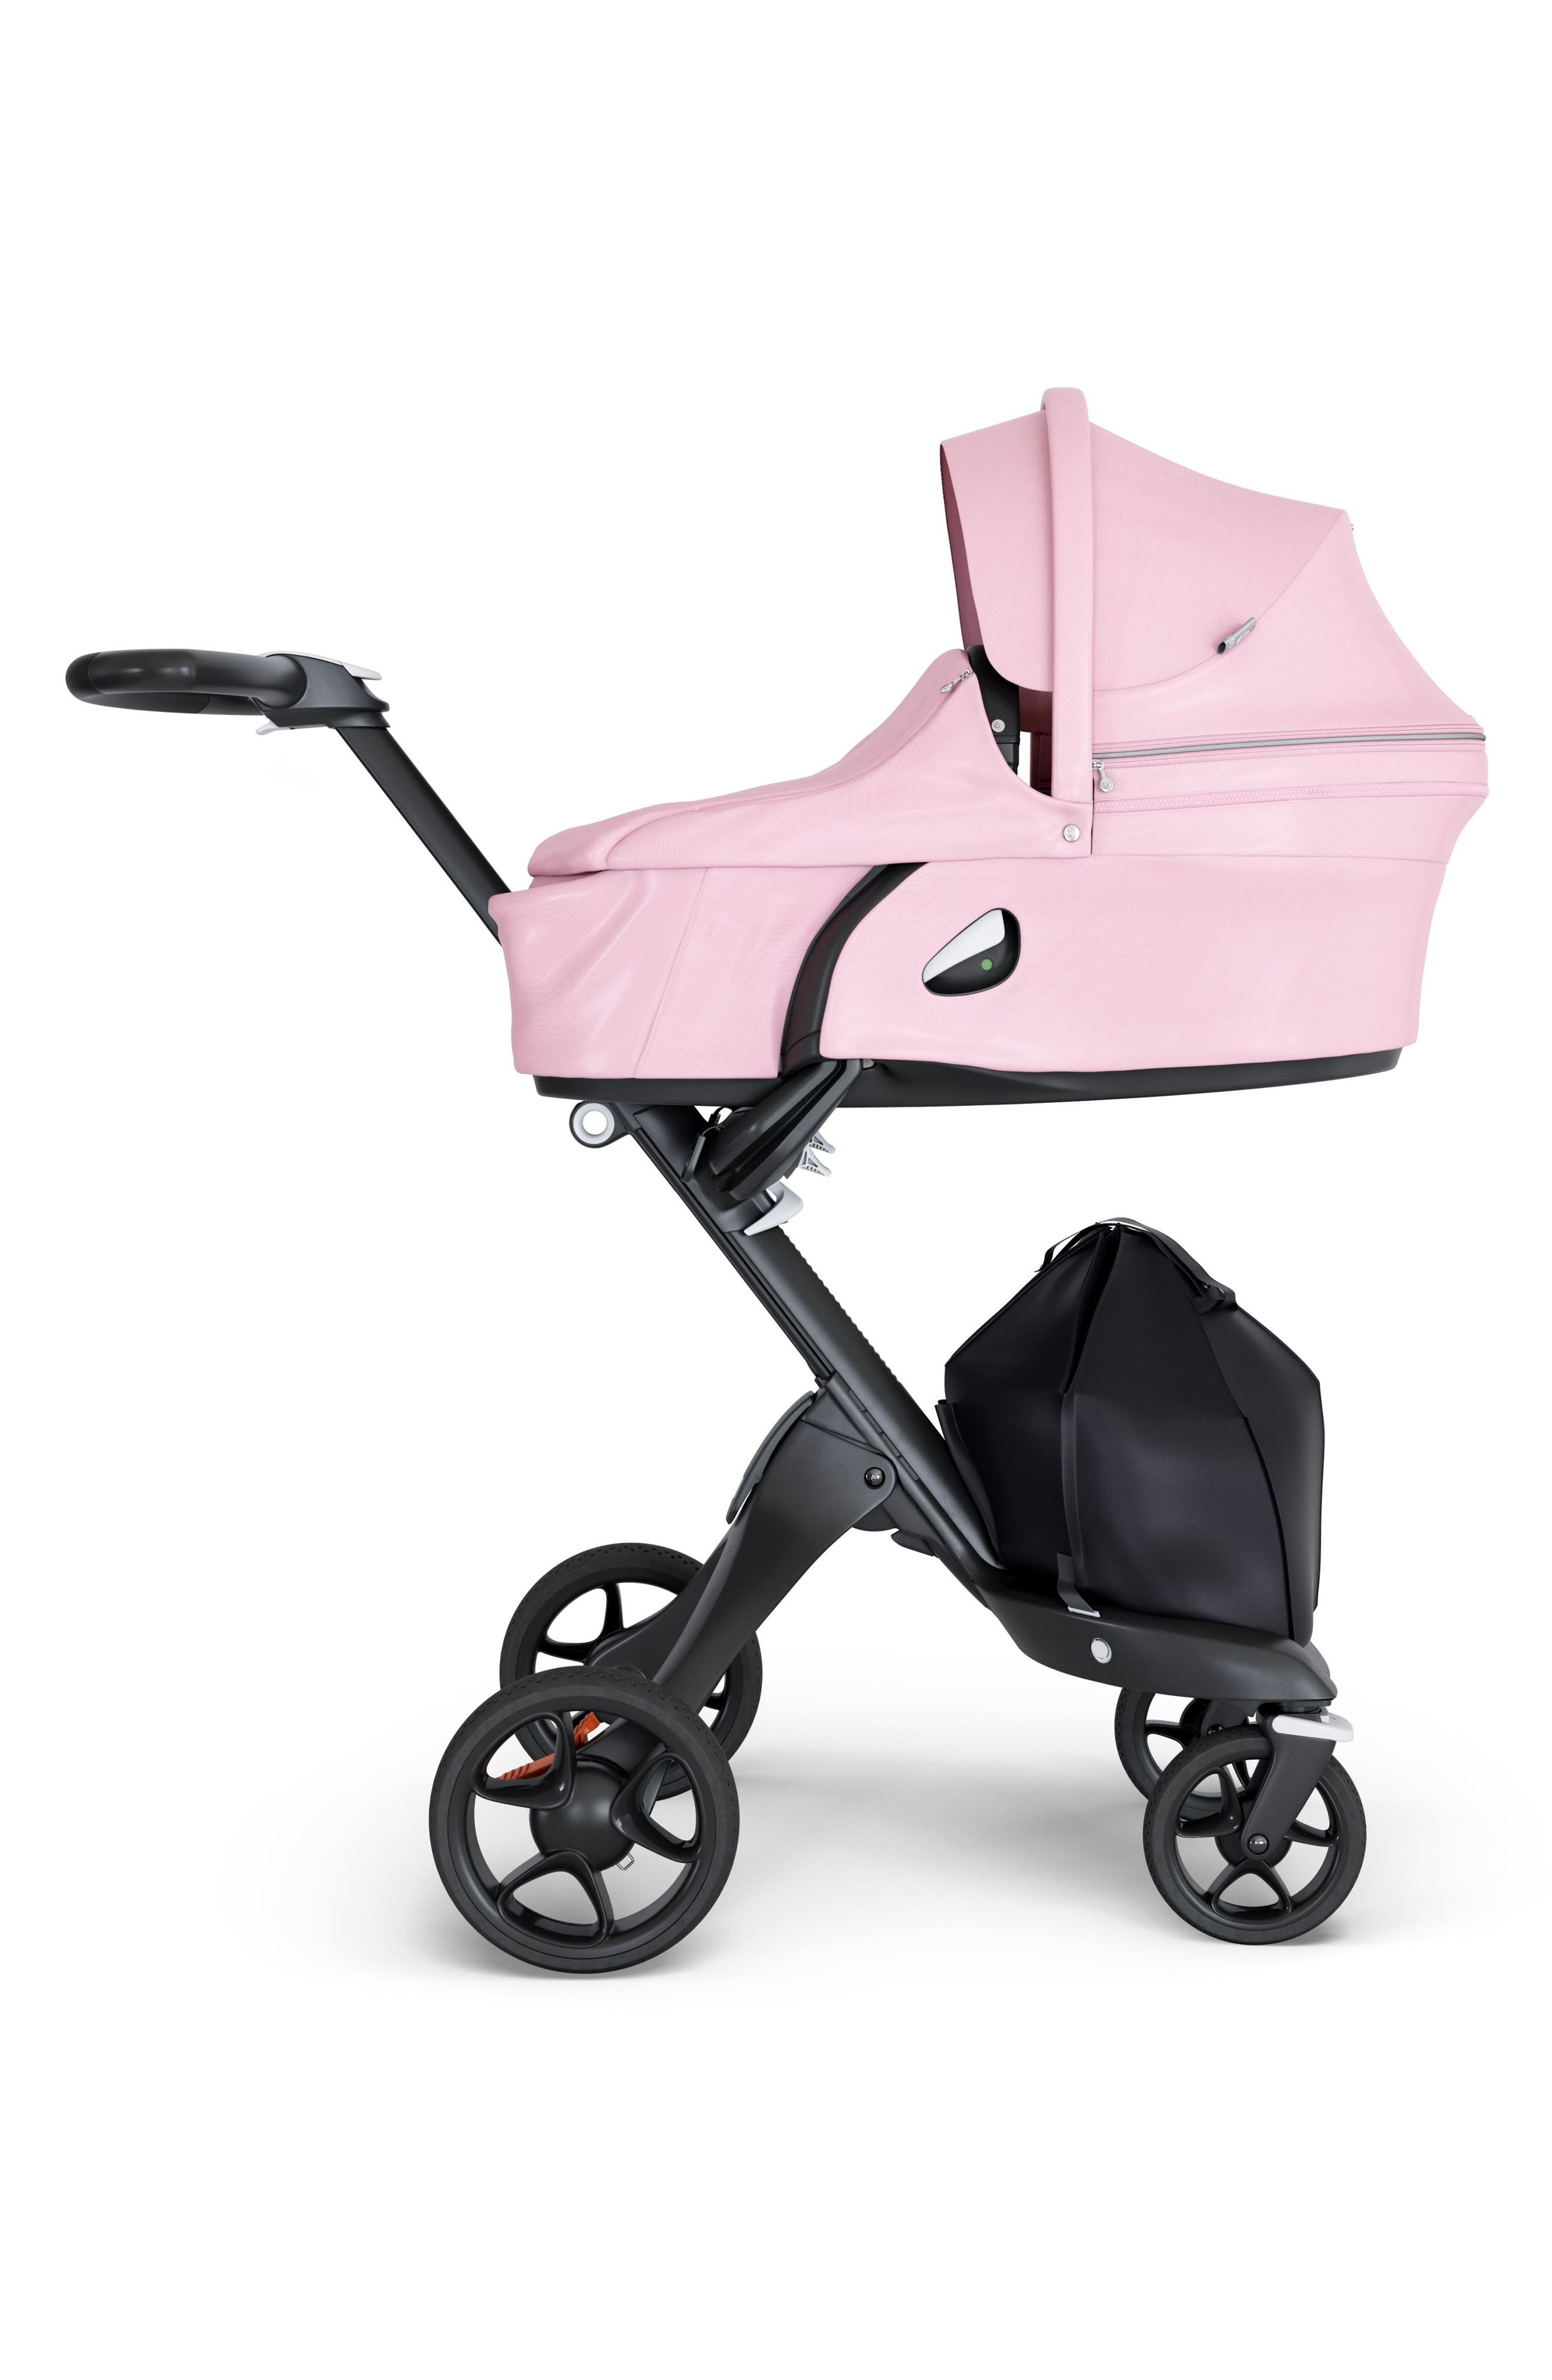 Main Image - Stokke Xplory® Carry Cot Attachment